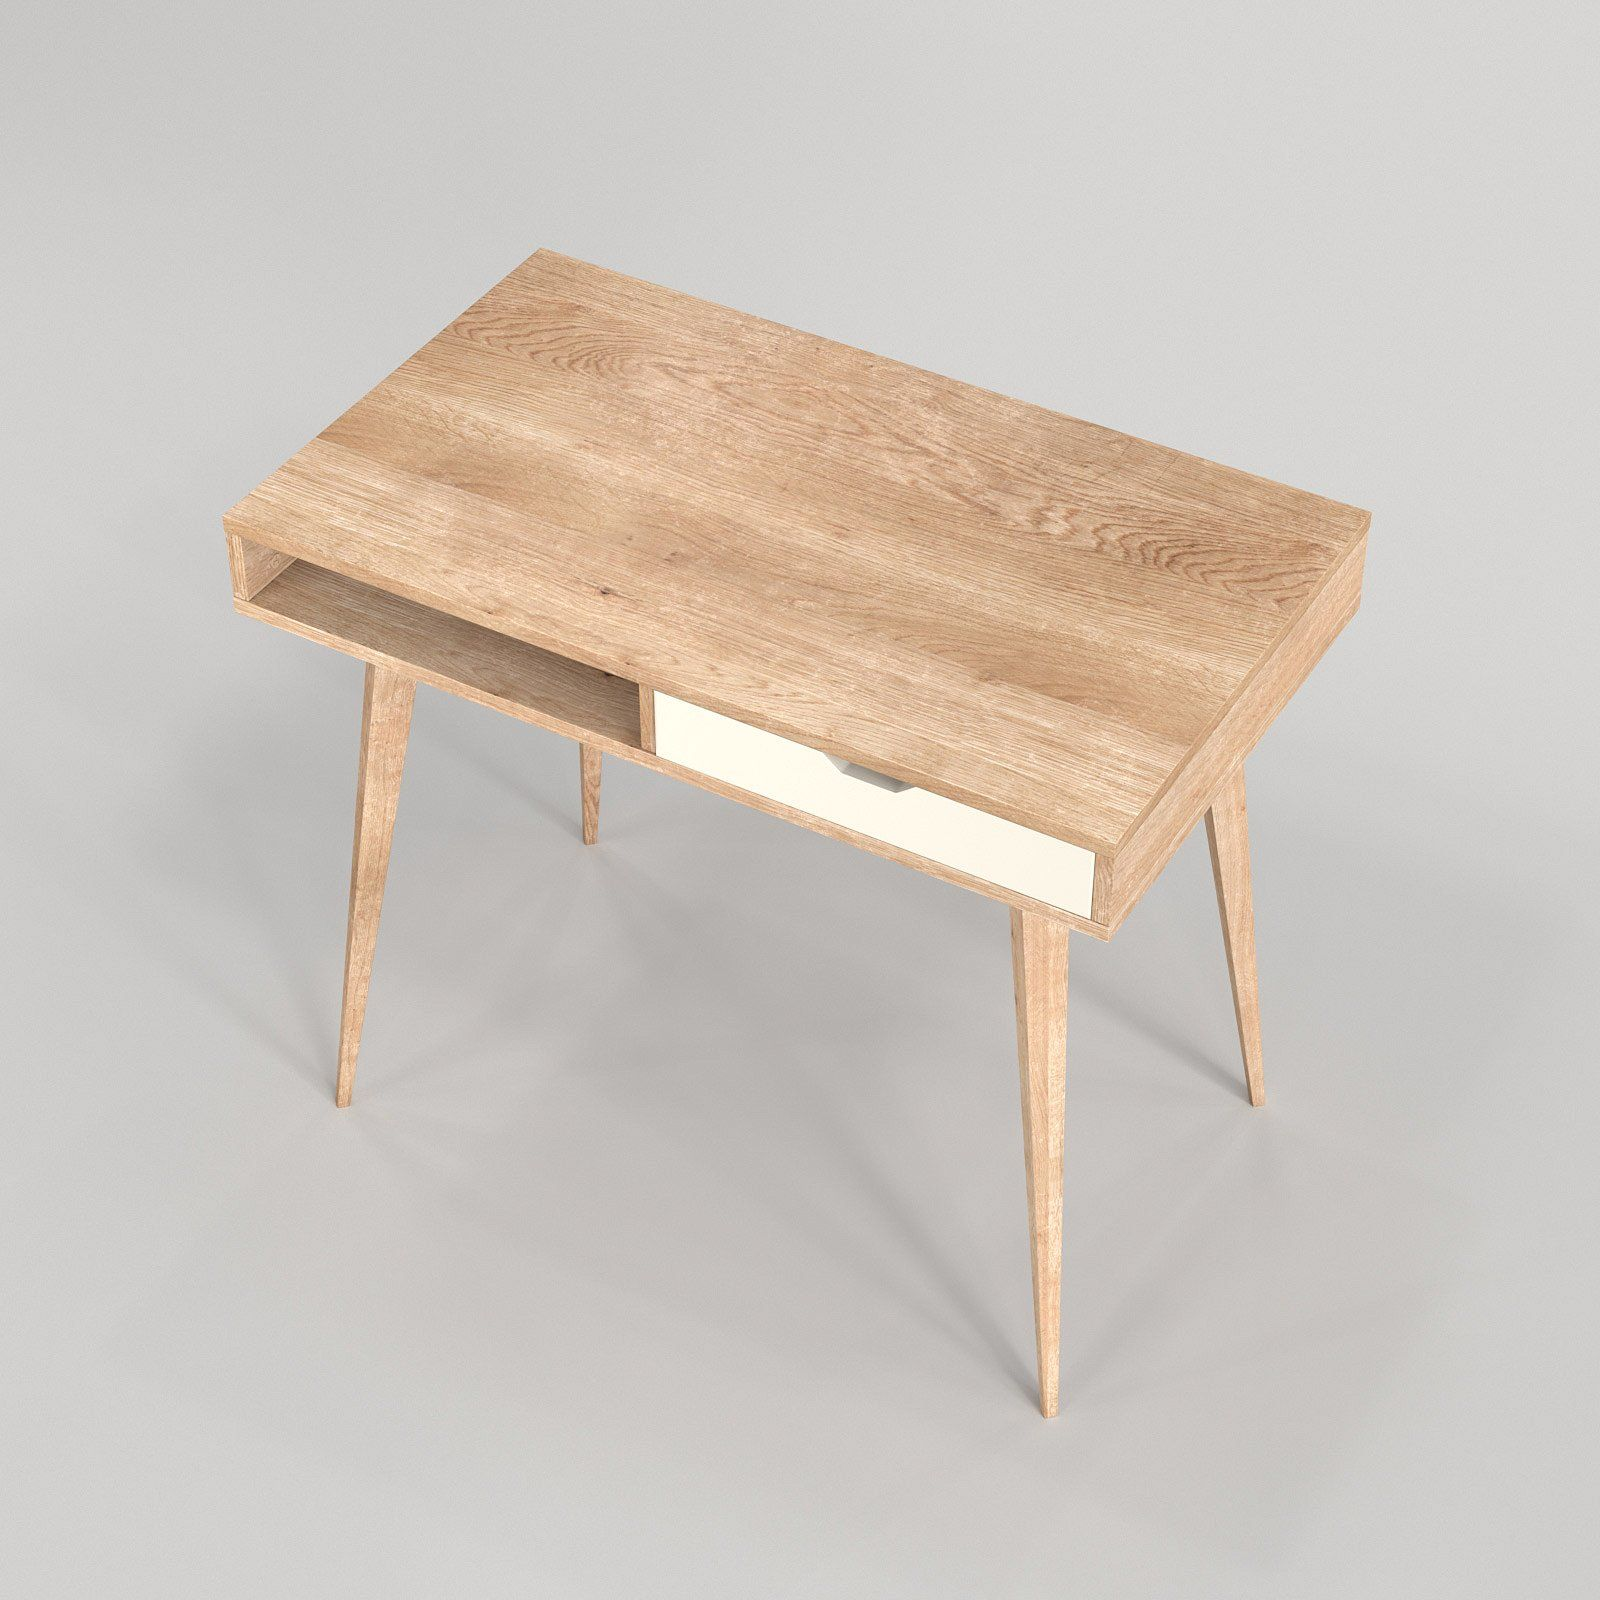 Scandinavian Desk 04 Scandinavian Desk Scandinavian